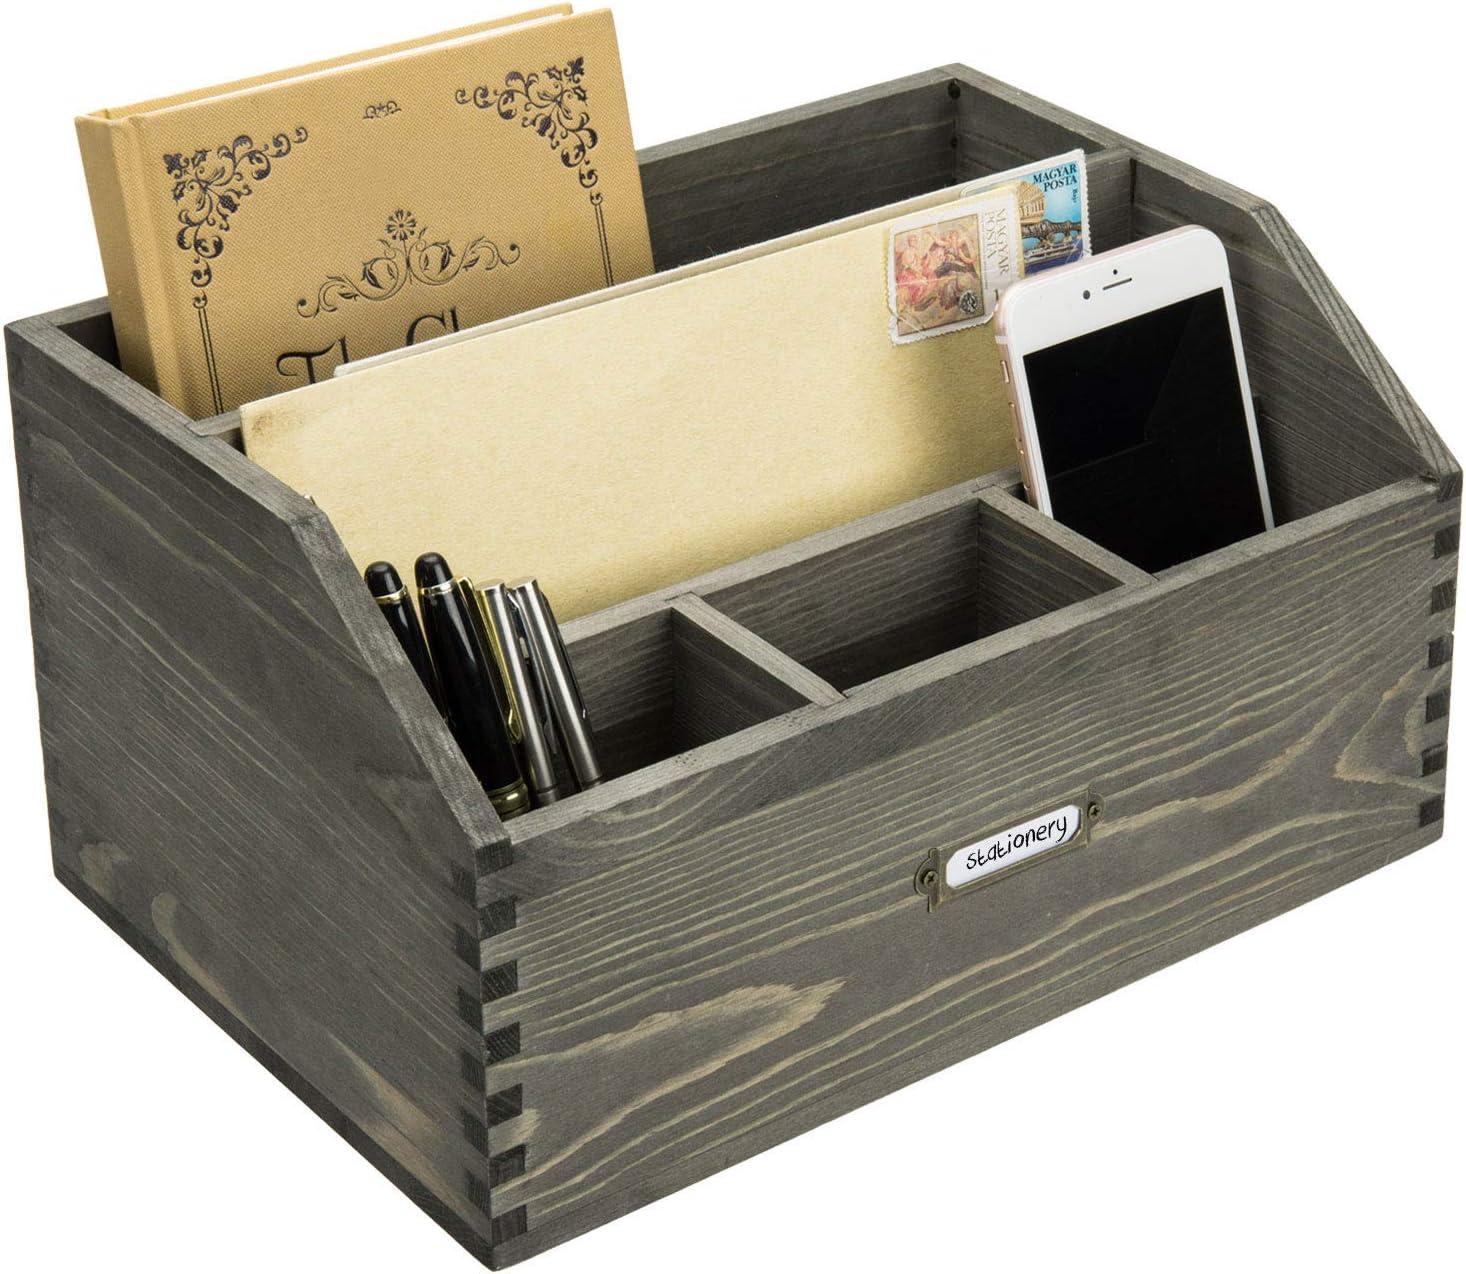 MyGift 5-Slot Vintage Gray Wood Large Desktop Document, Folder and Office Supplies Organizer with Antique Metal Label Holder